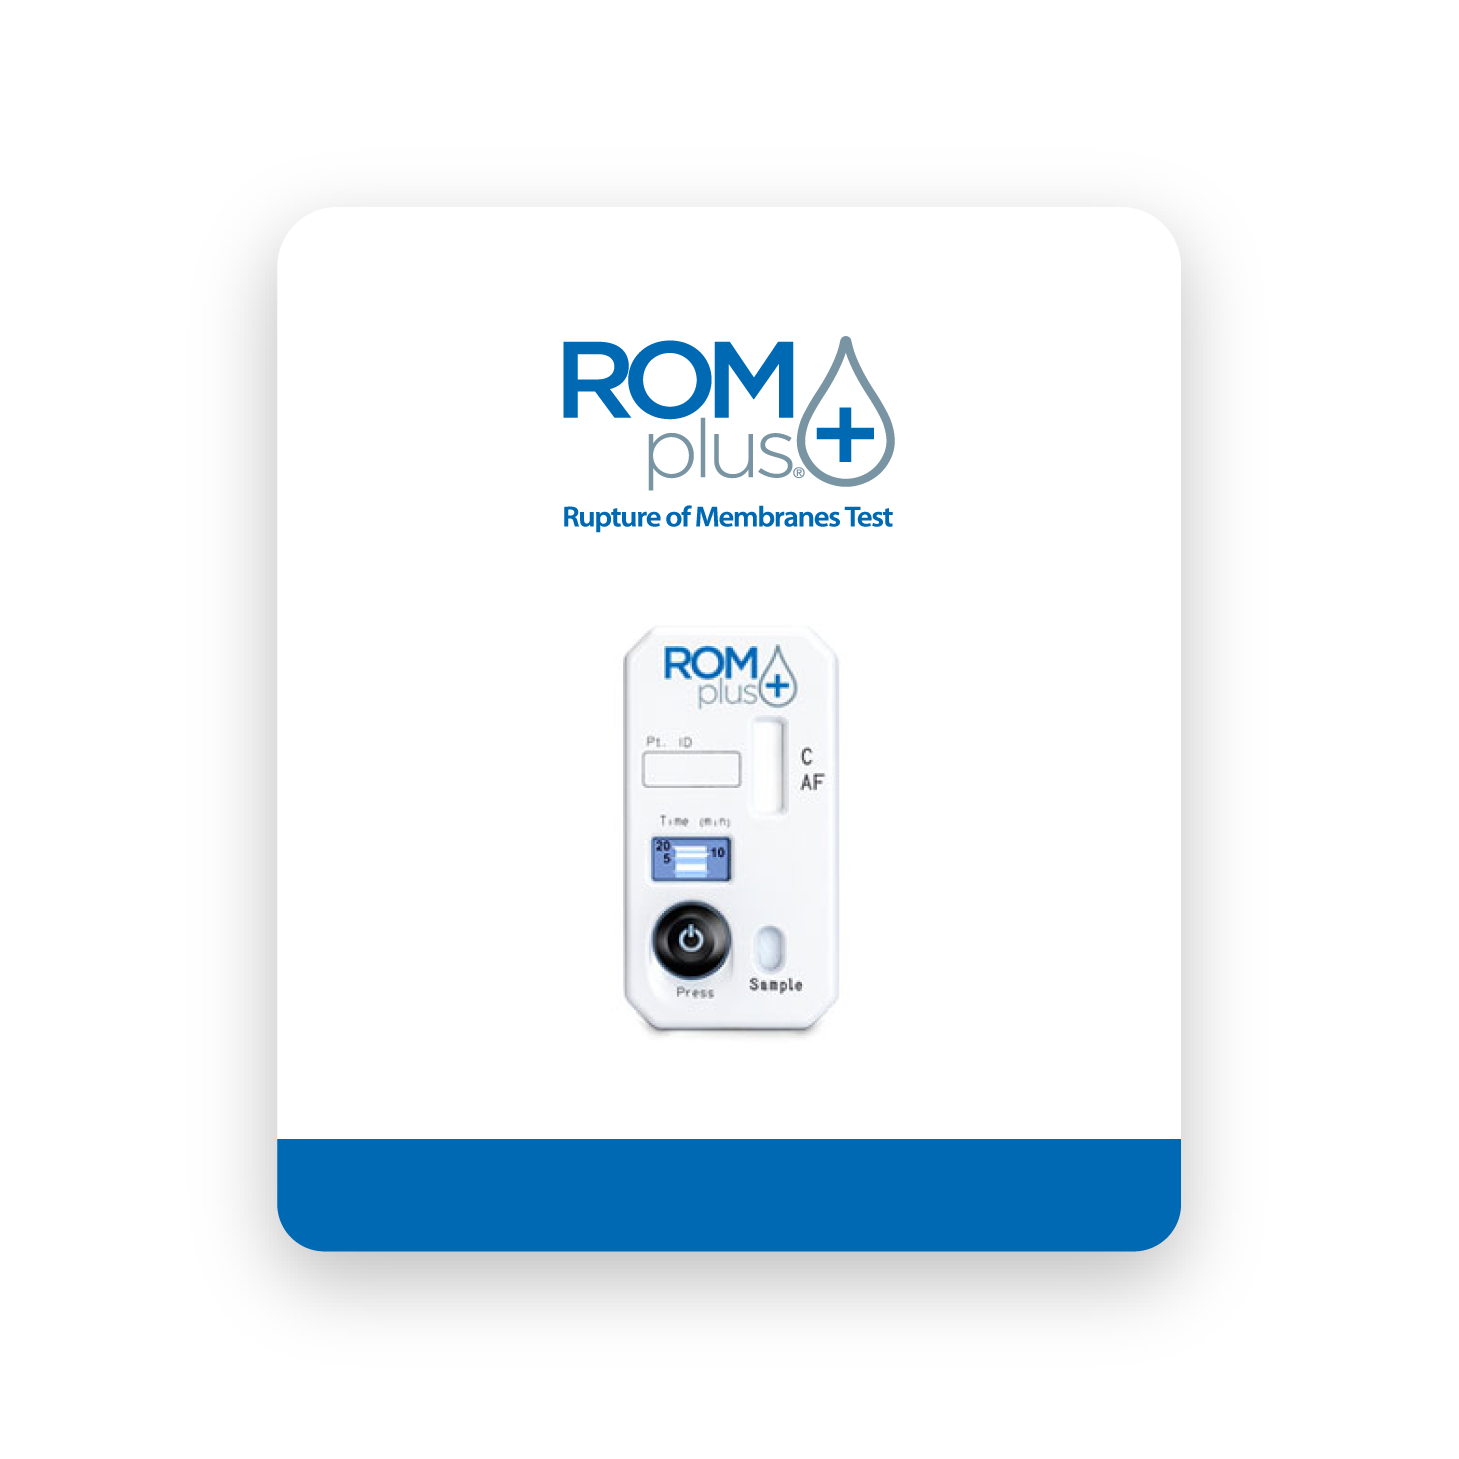 ROM Plus Rupture of Membranes Test